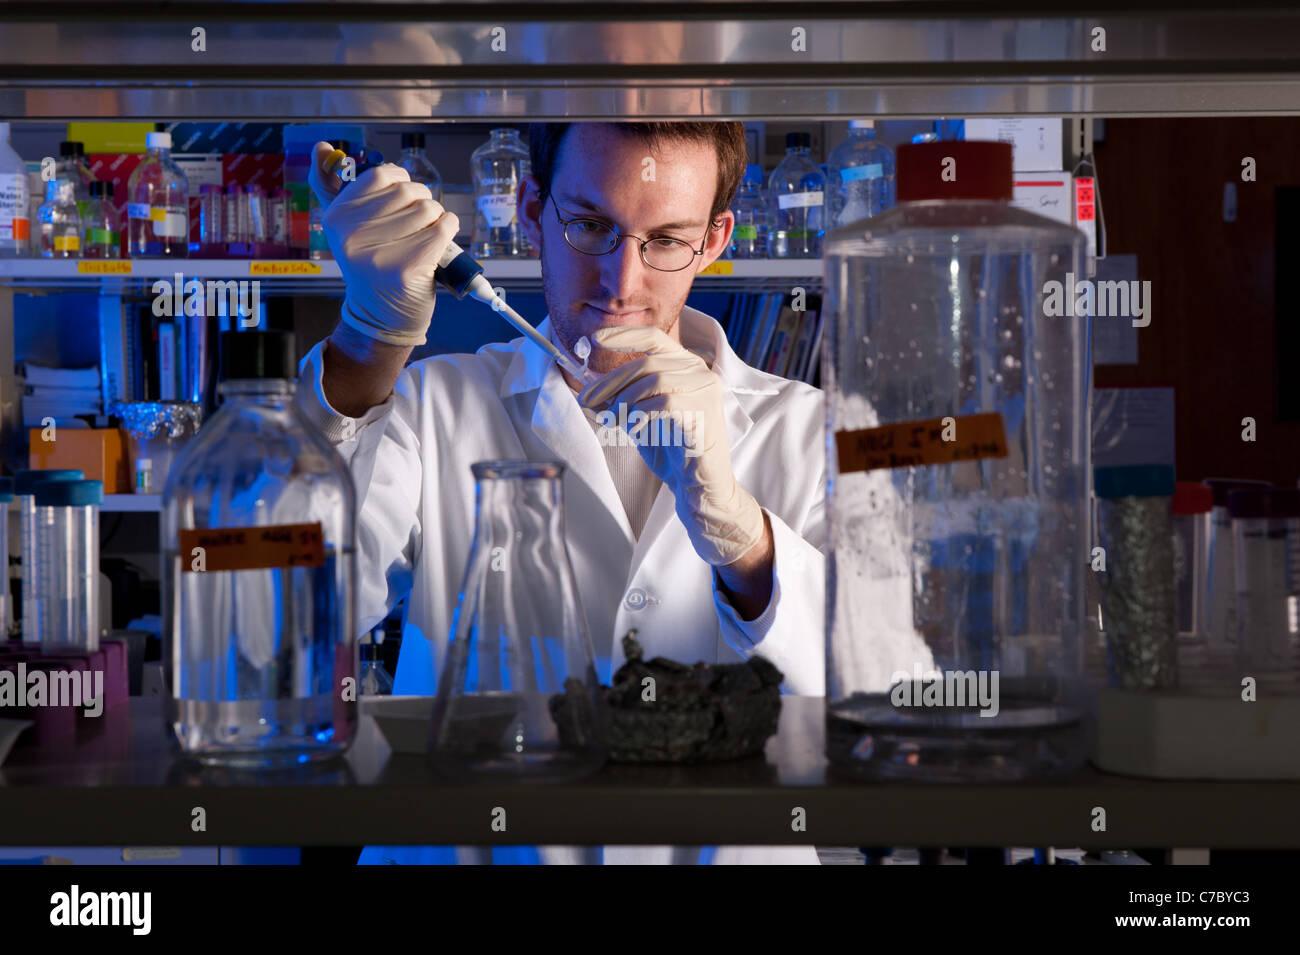 Scientist conducting experiment in lab - Stock Image